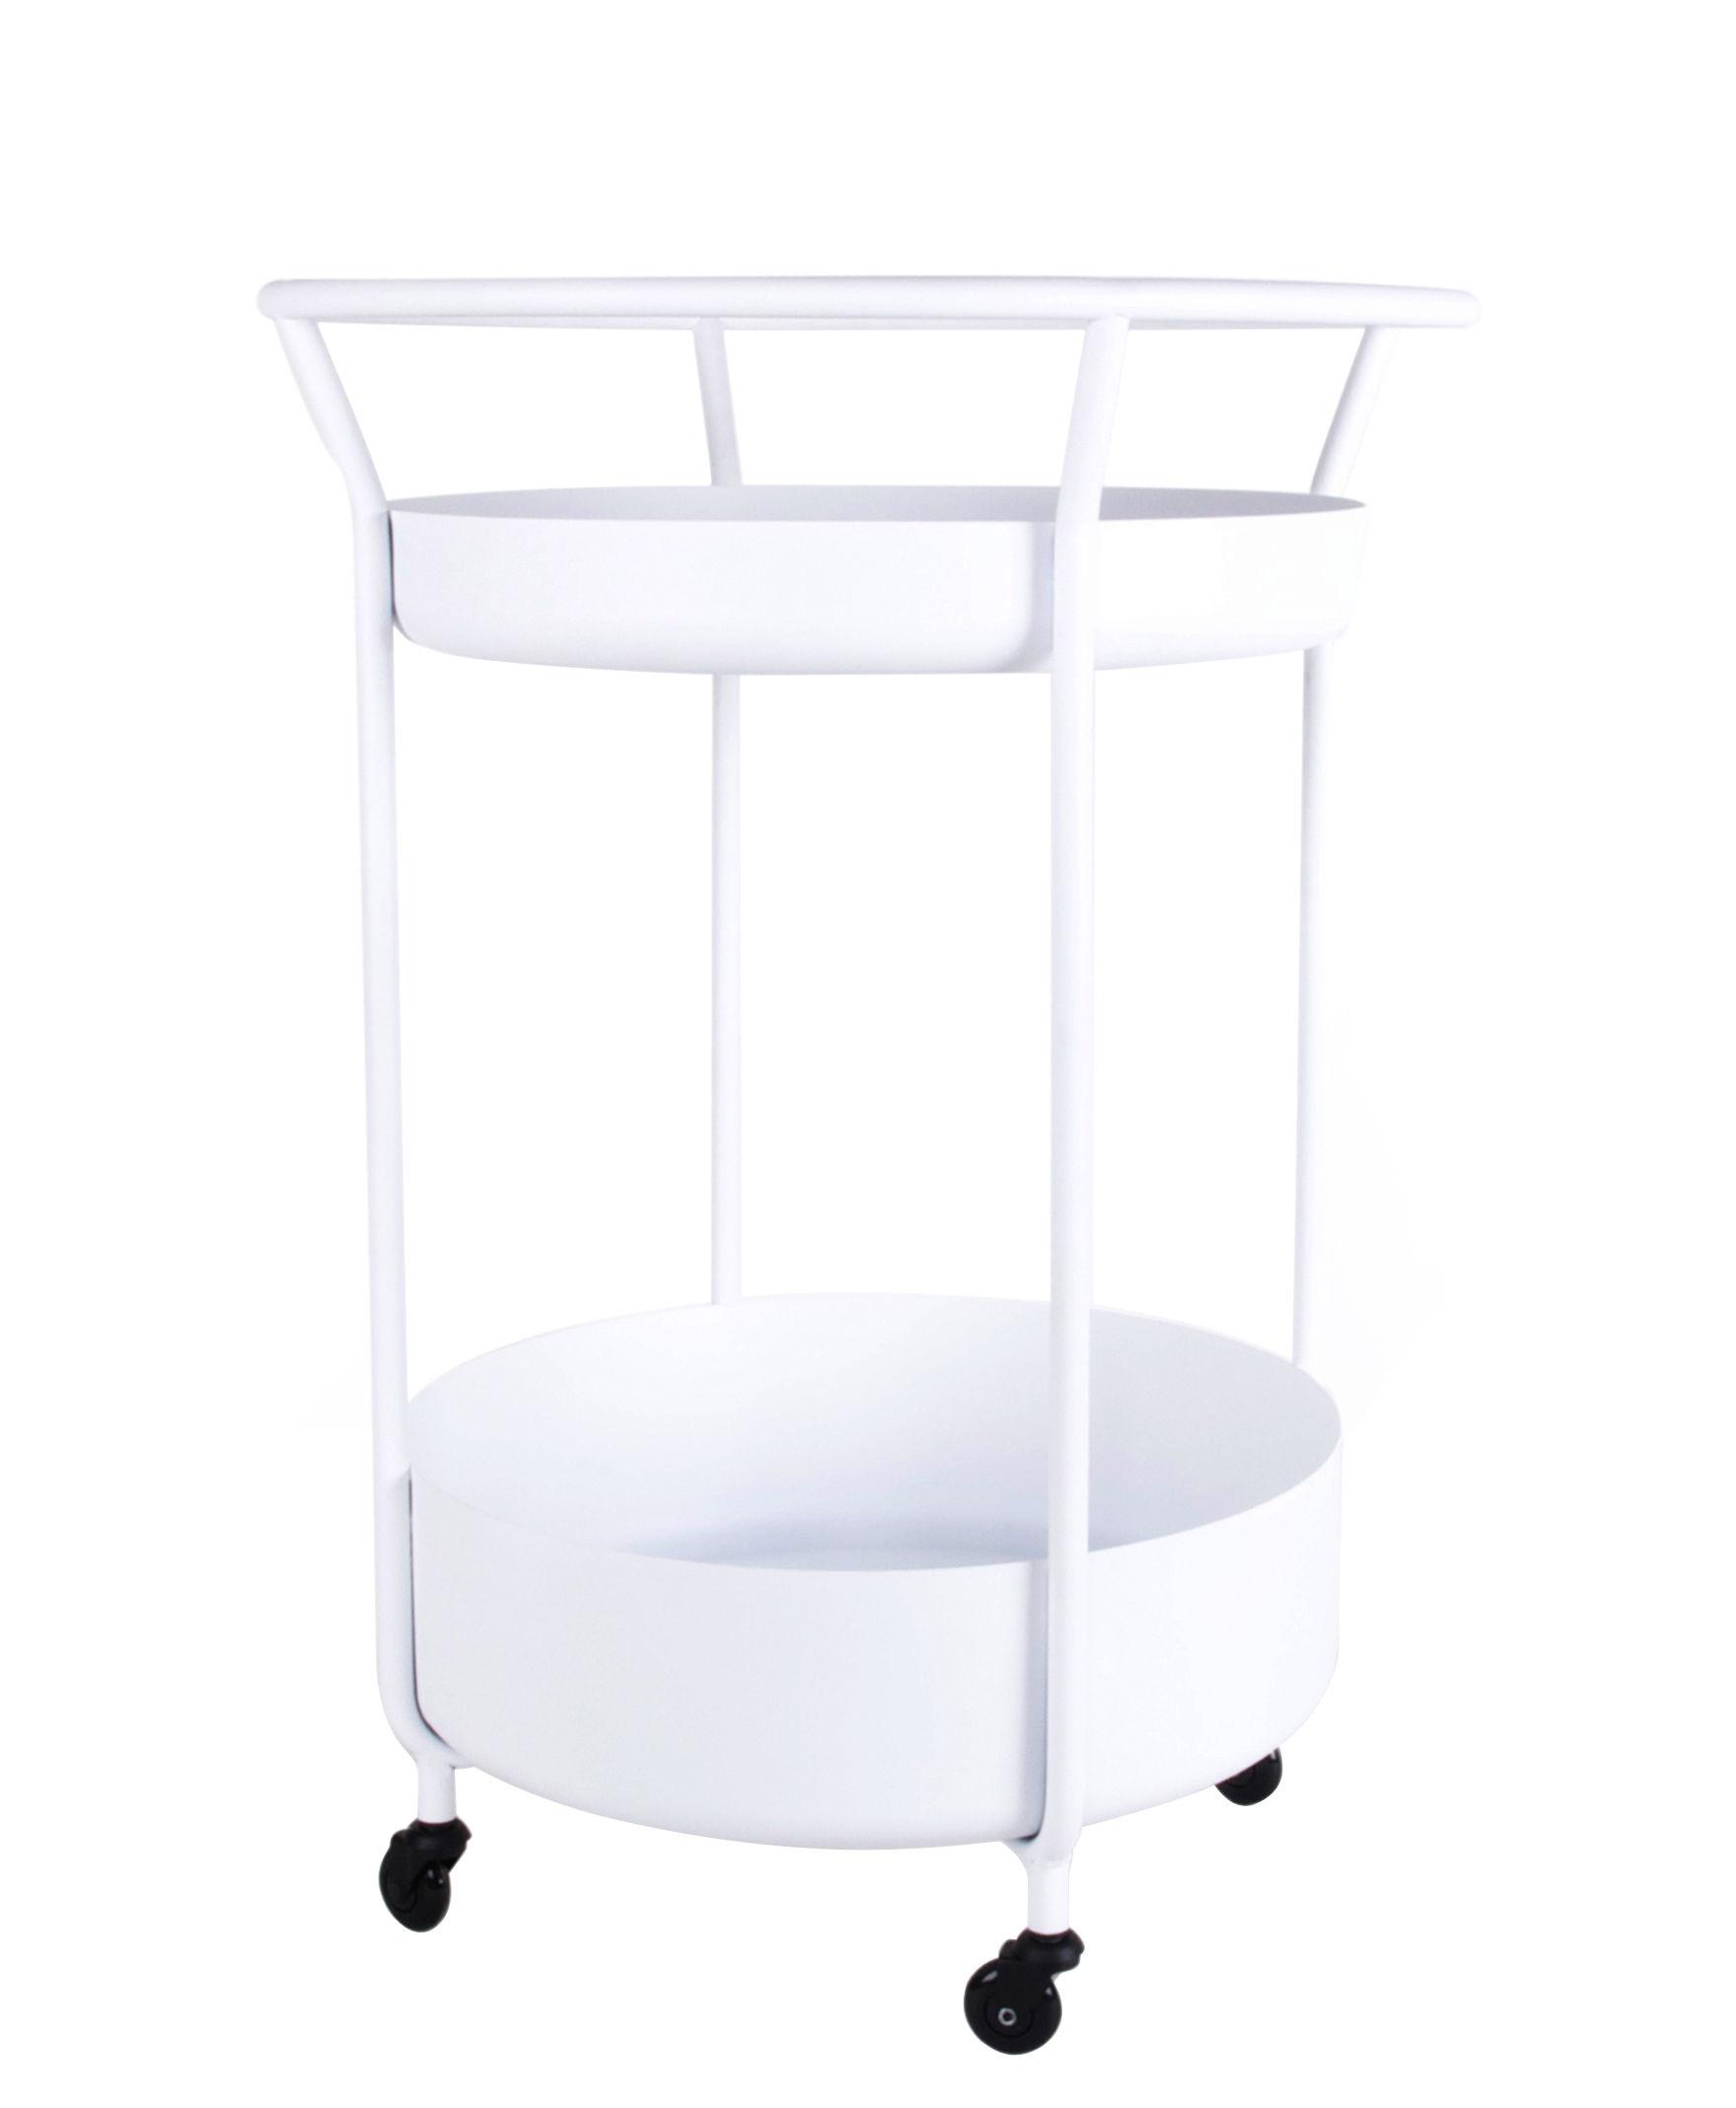 Möbel - Beistell-Möbel - Corona Ablage / Stahl - XL Boom - Weiß - Acier laqué époxy